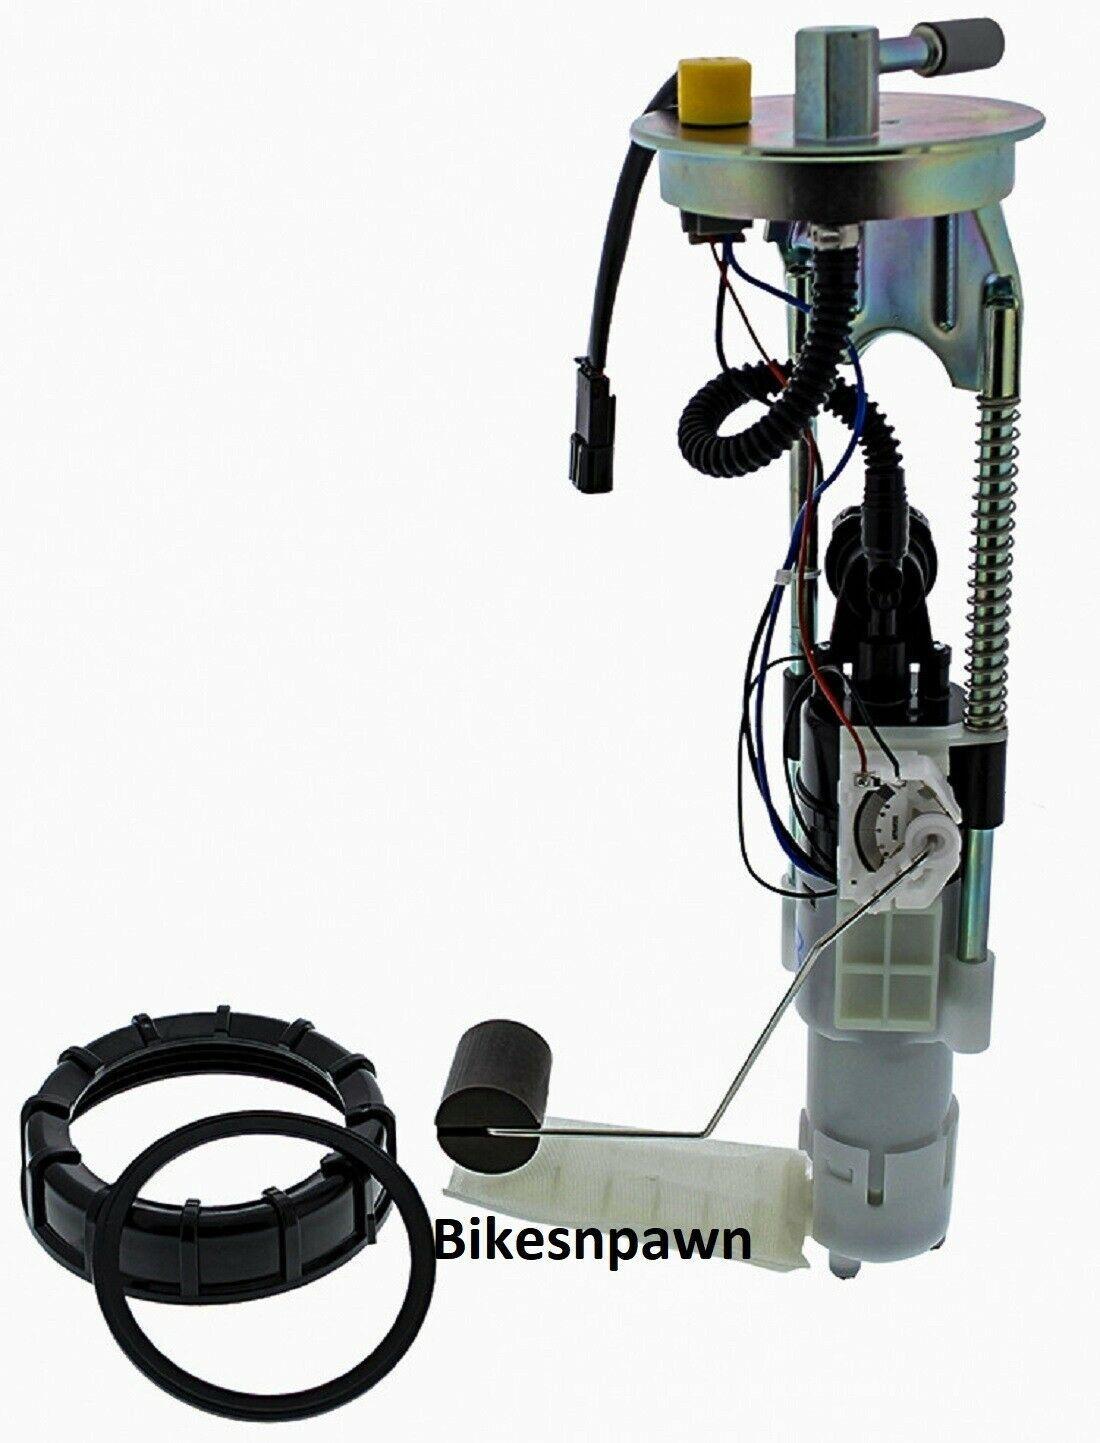 New Fuel Pump Assembly for Polaris Sportsman XP 550/850 2009-2010